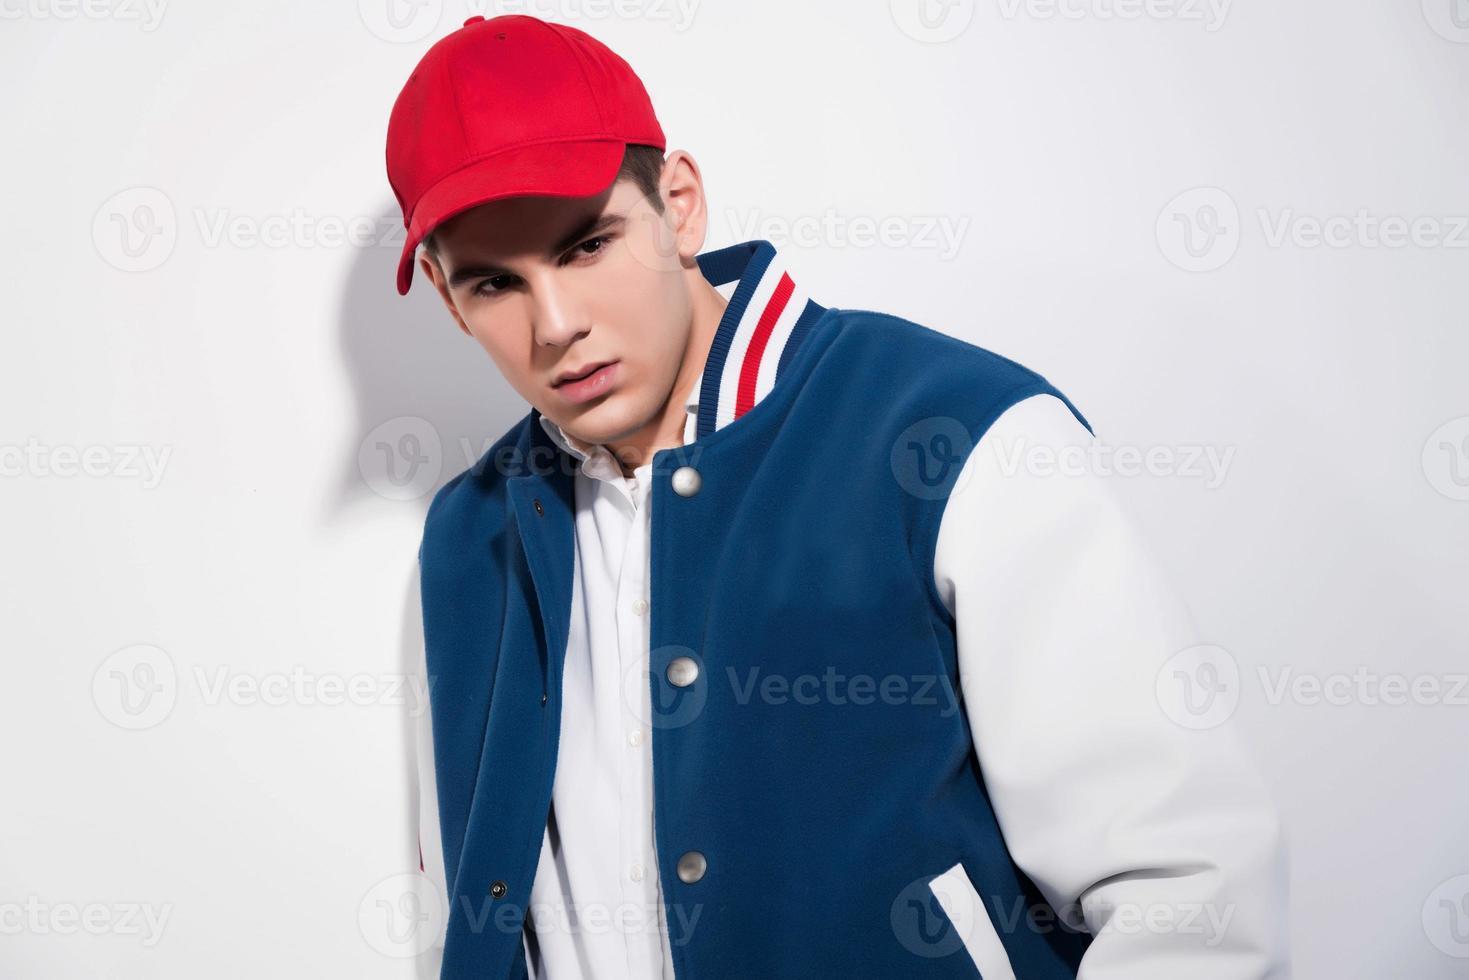 uomo di moda sportiva retrò anni cinquanta indossa giacca da baseball blu. foto